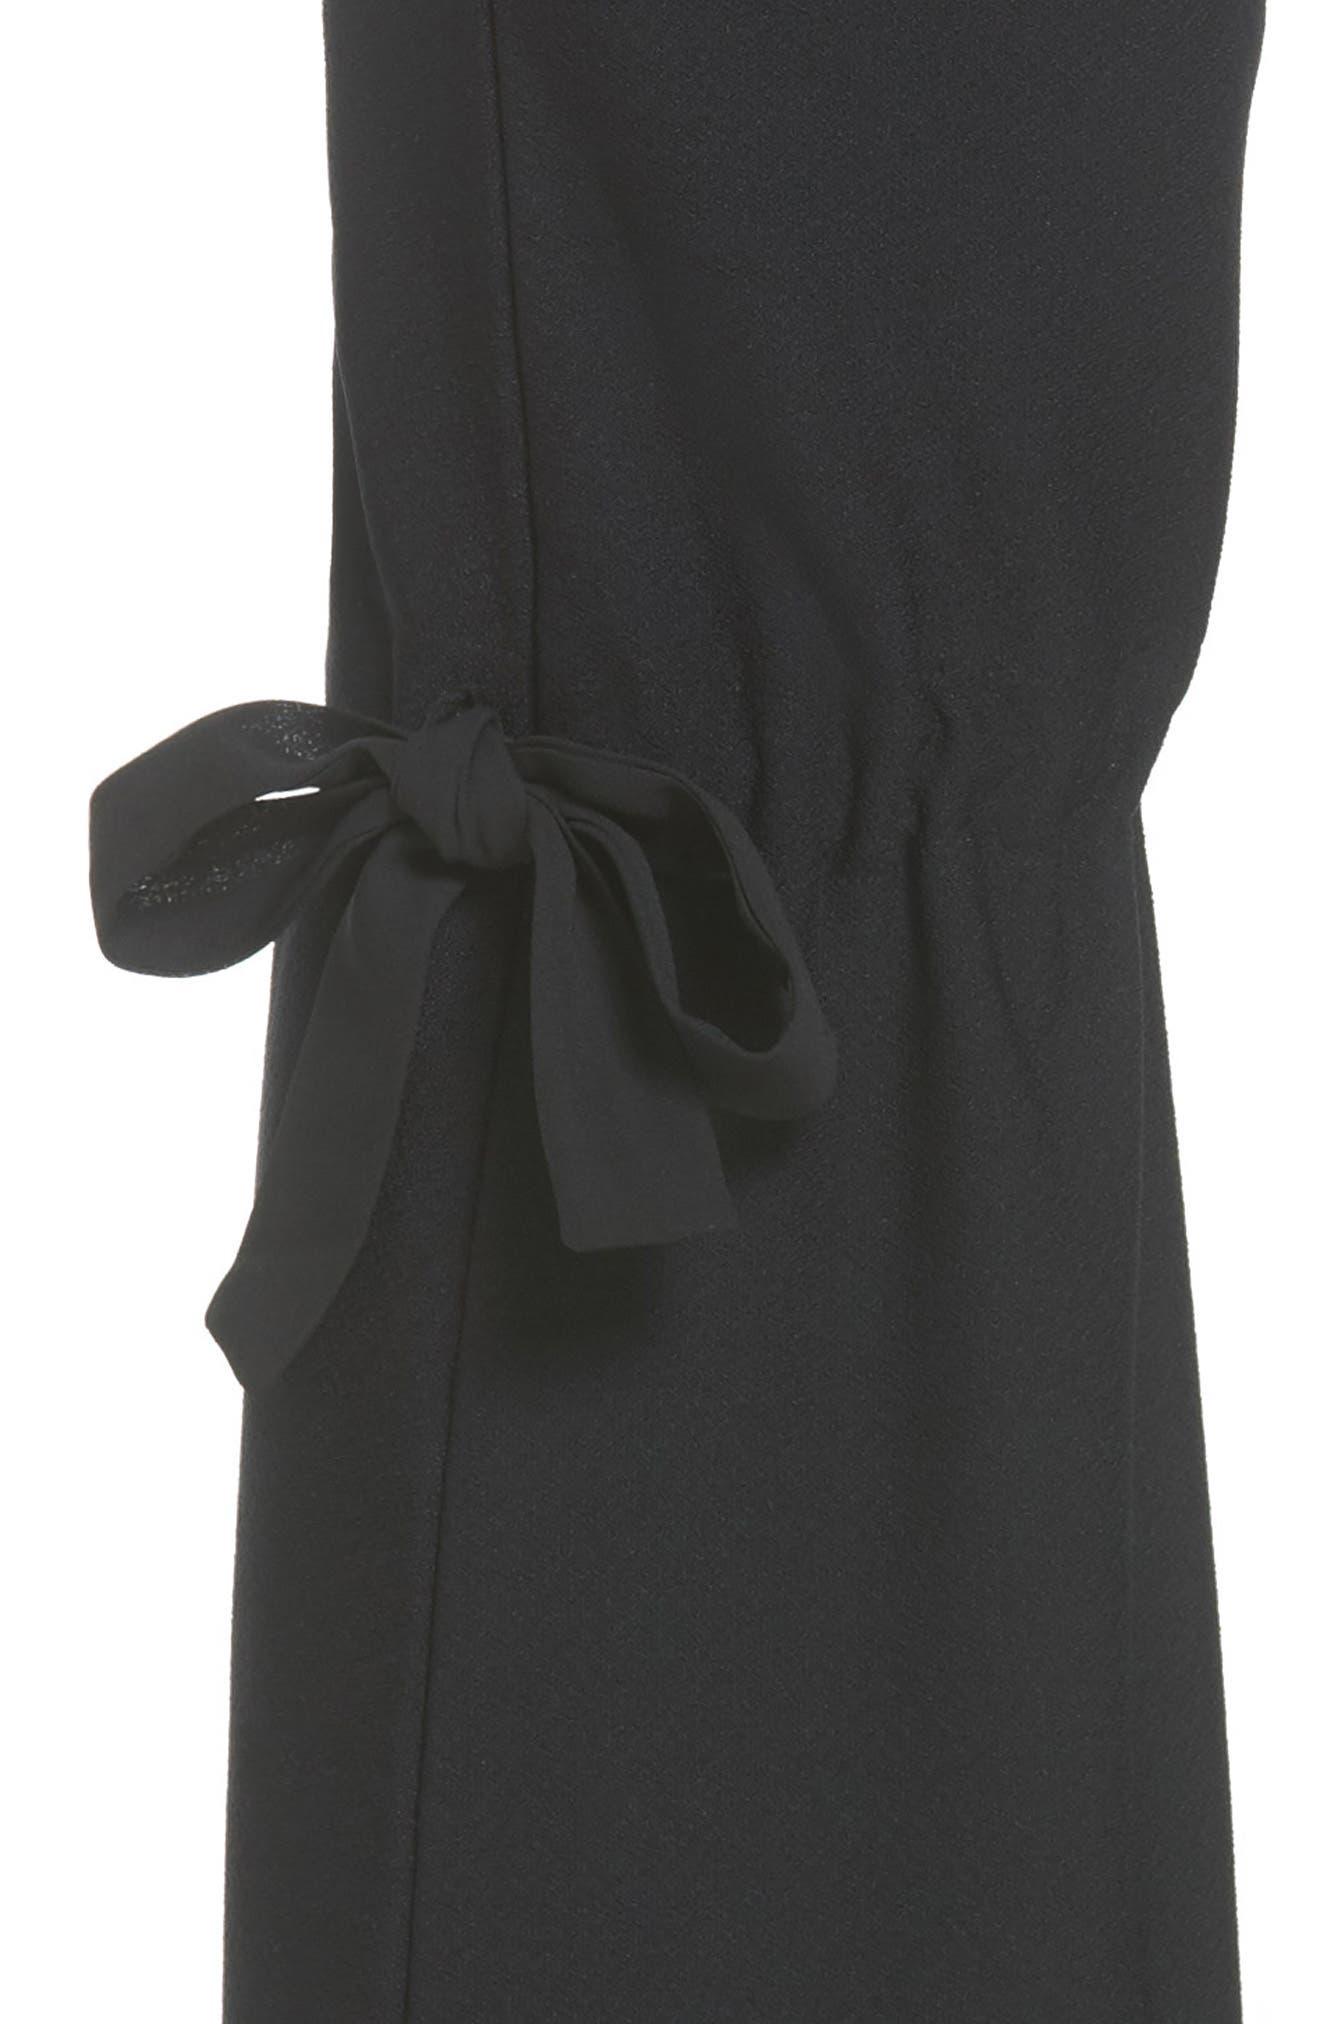 Arcadia High Waist Pants,                             Alternate thumbnail 5, color,                             Black